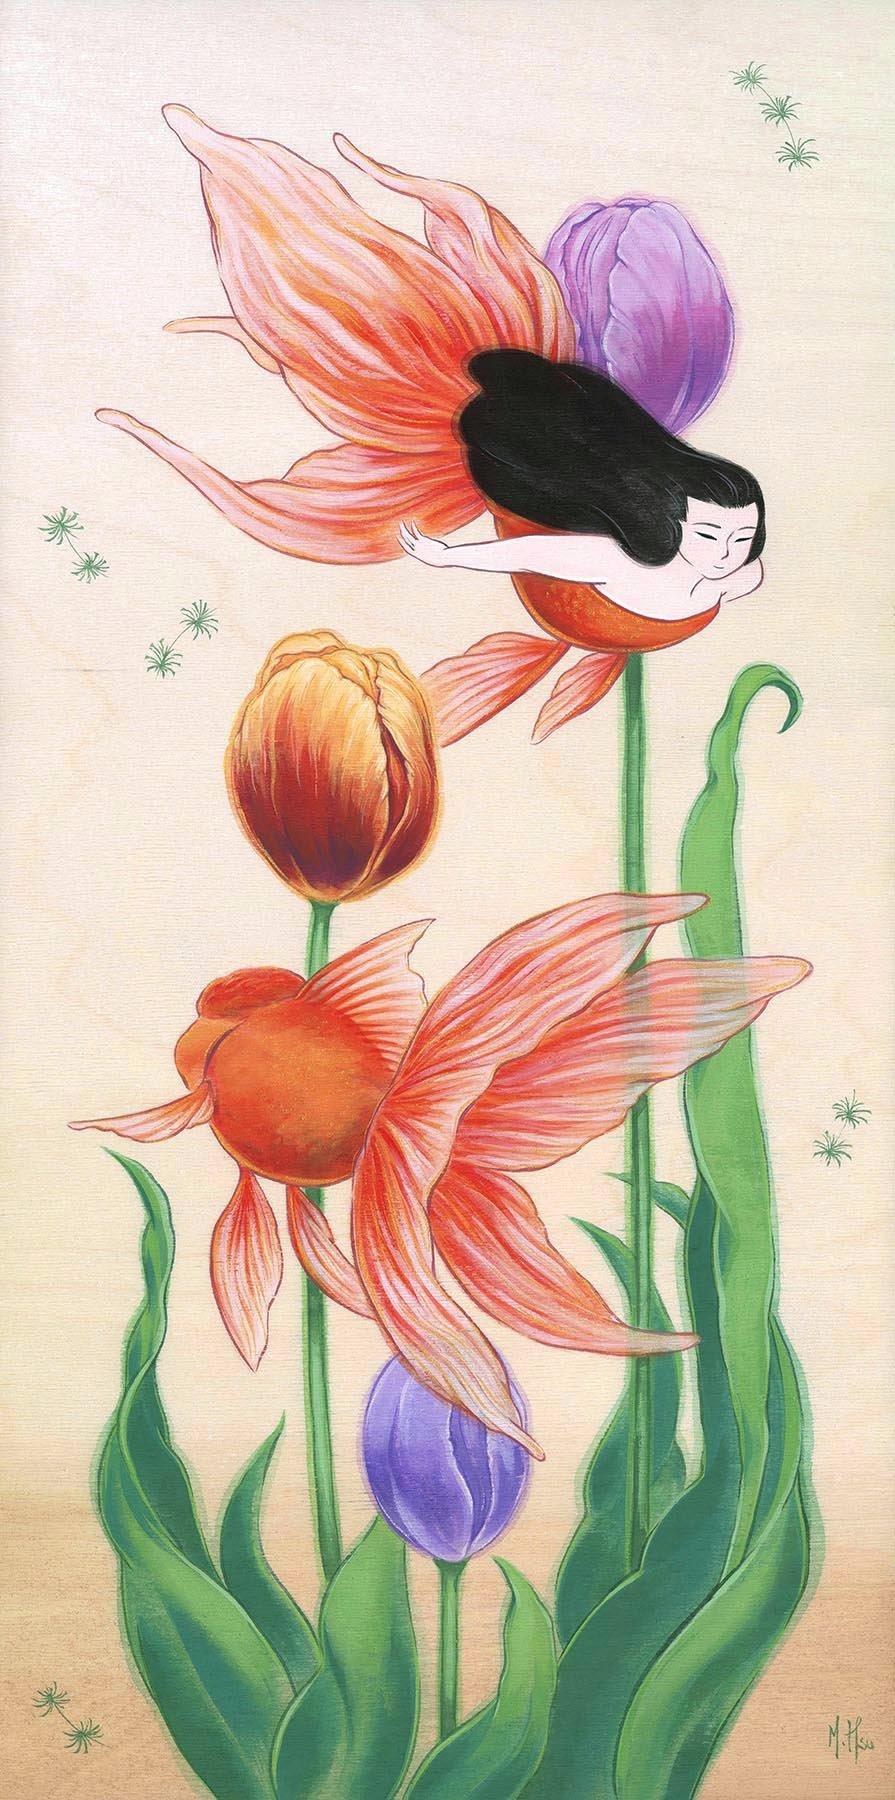 "Goldfish and Tulips 11 x 14"" Print"